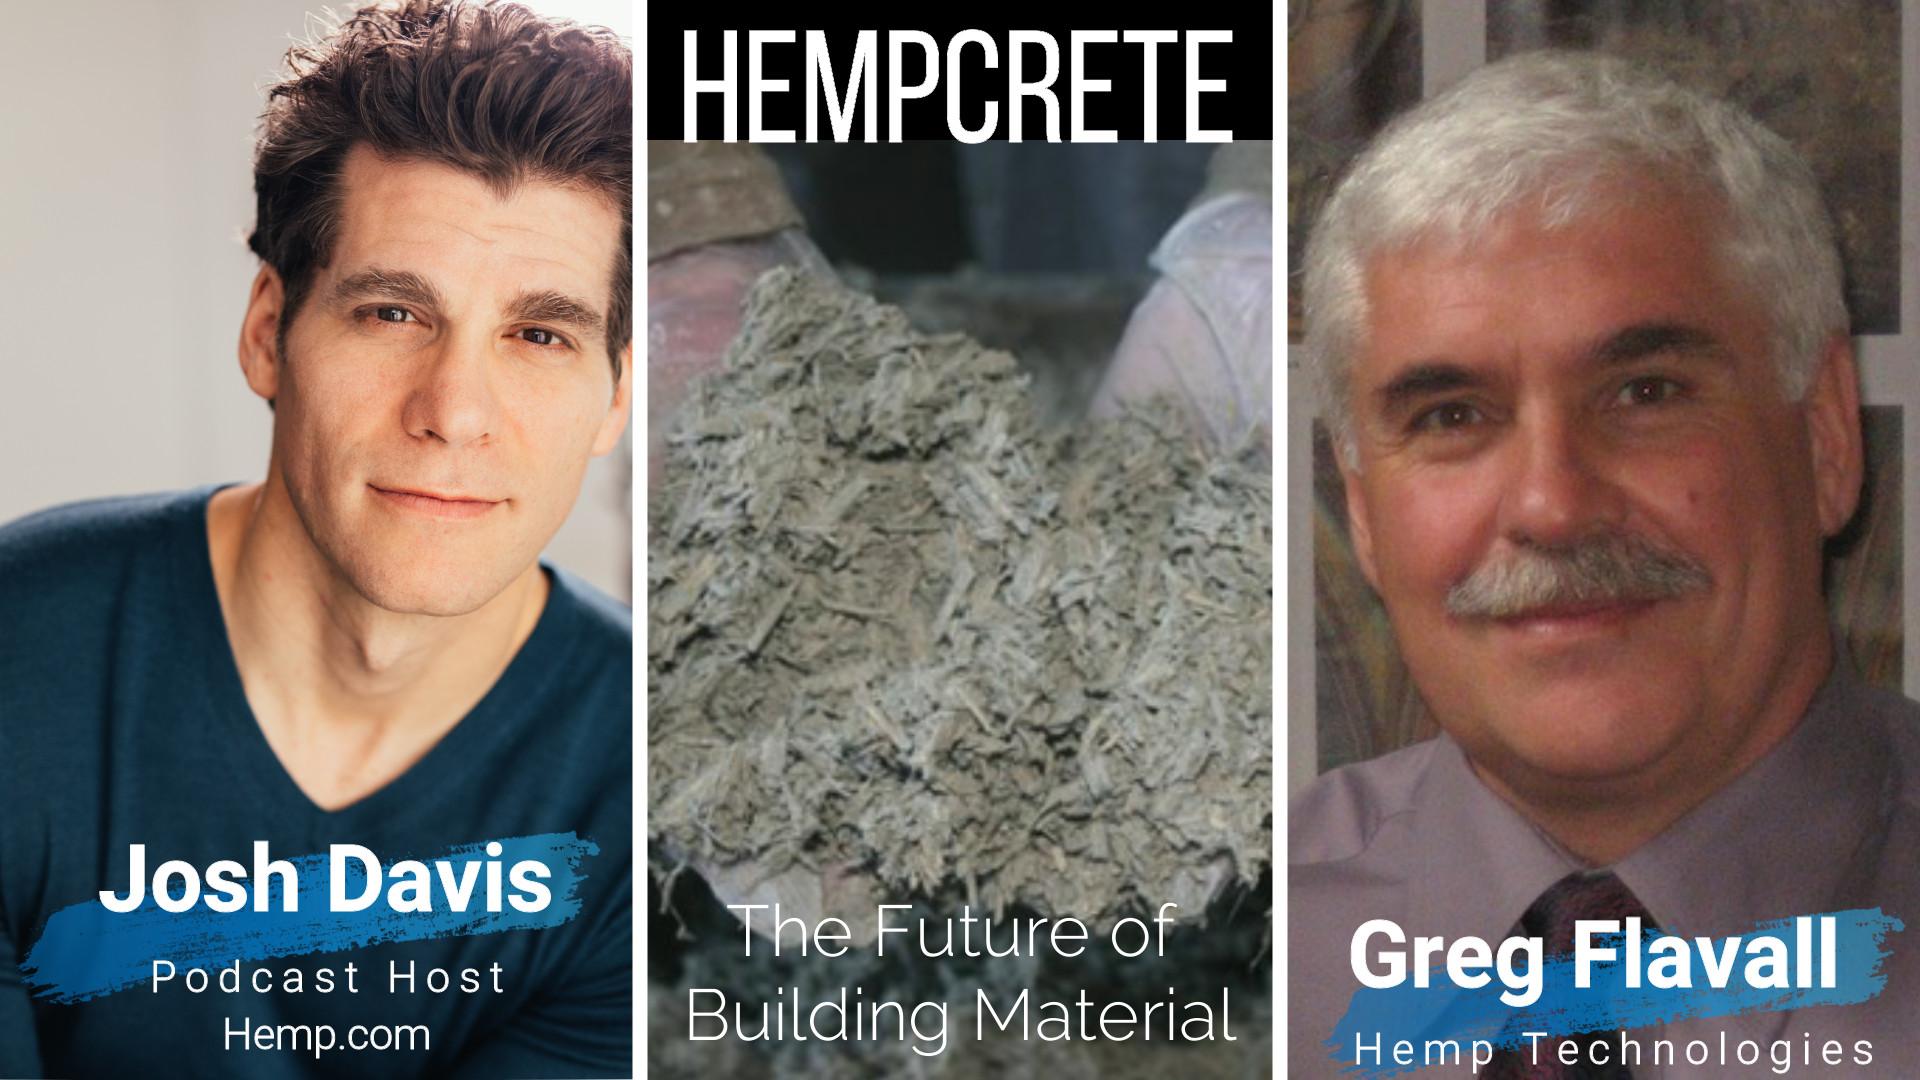 Video-hemp and Hempcrete as a building material